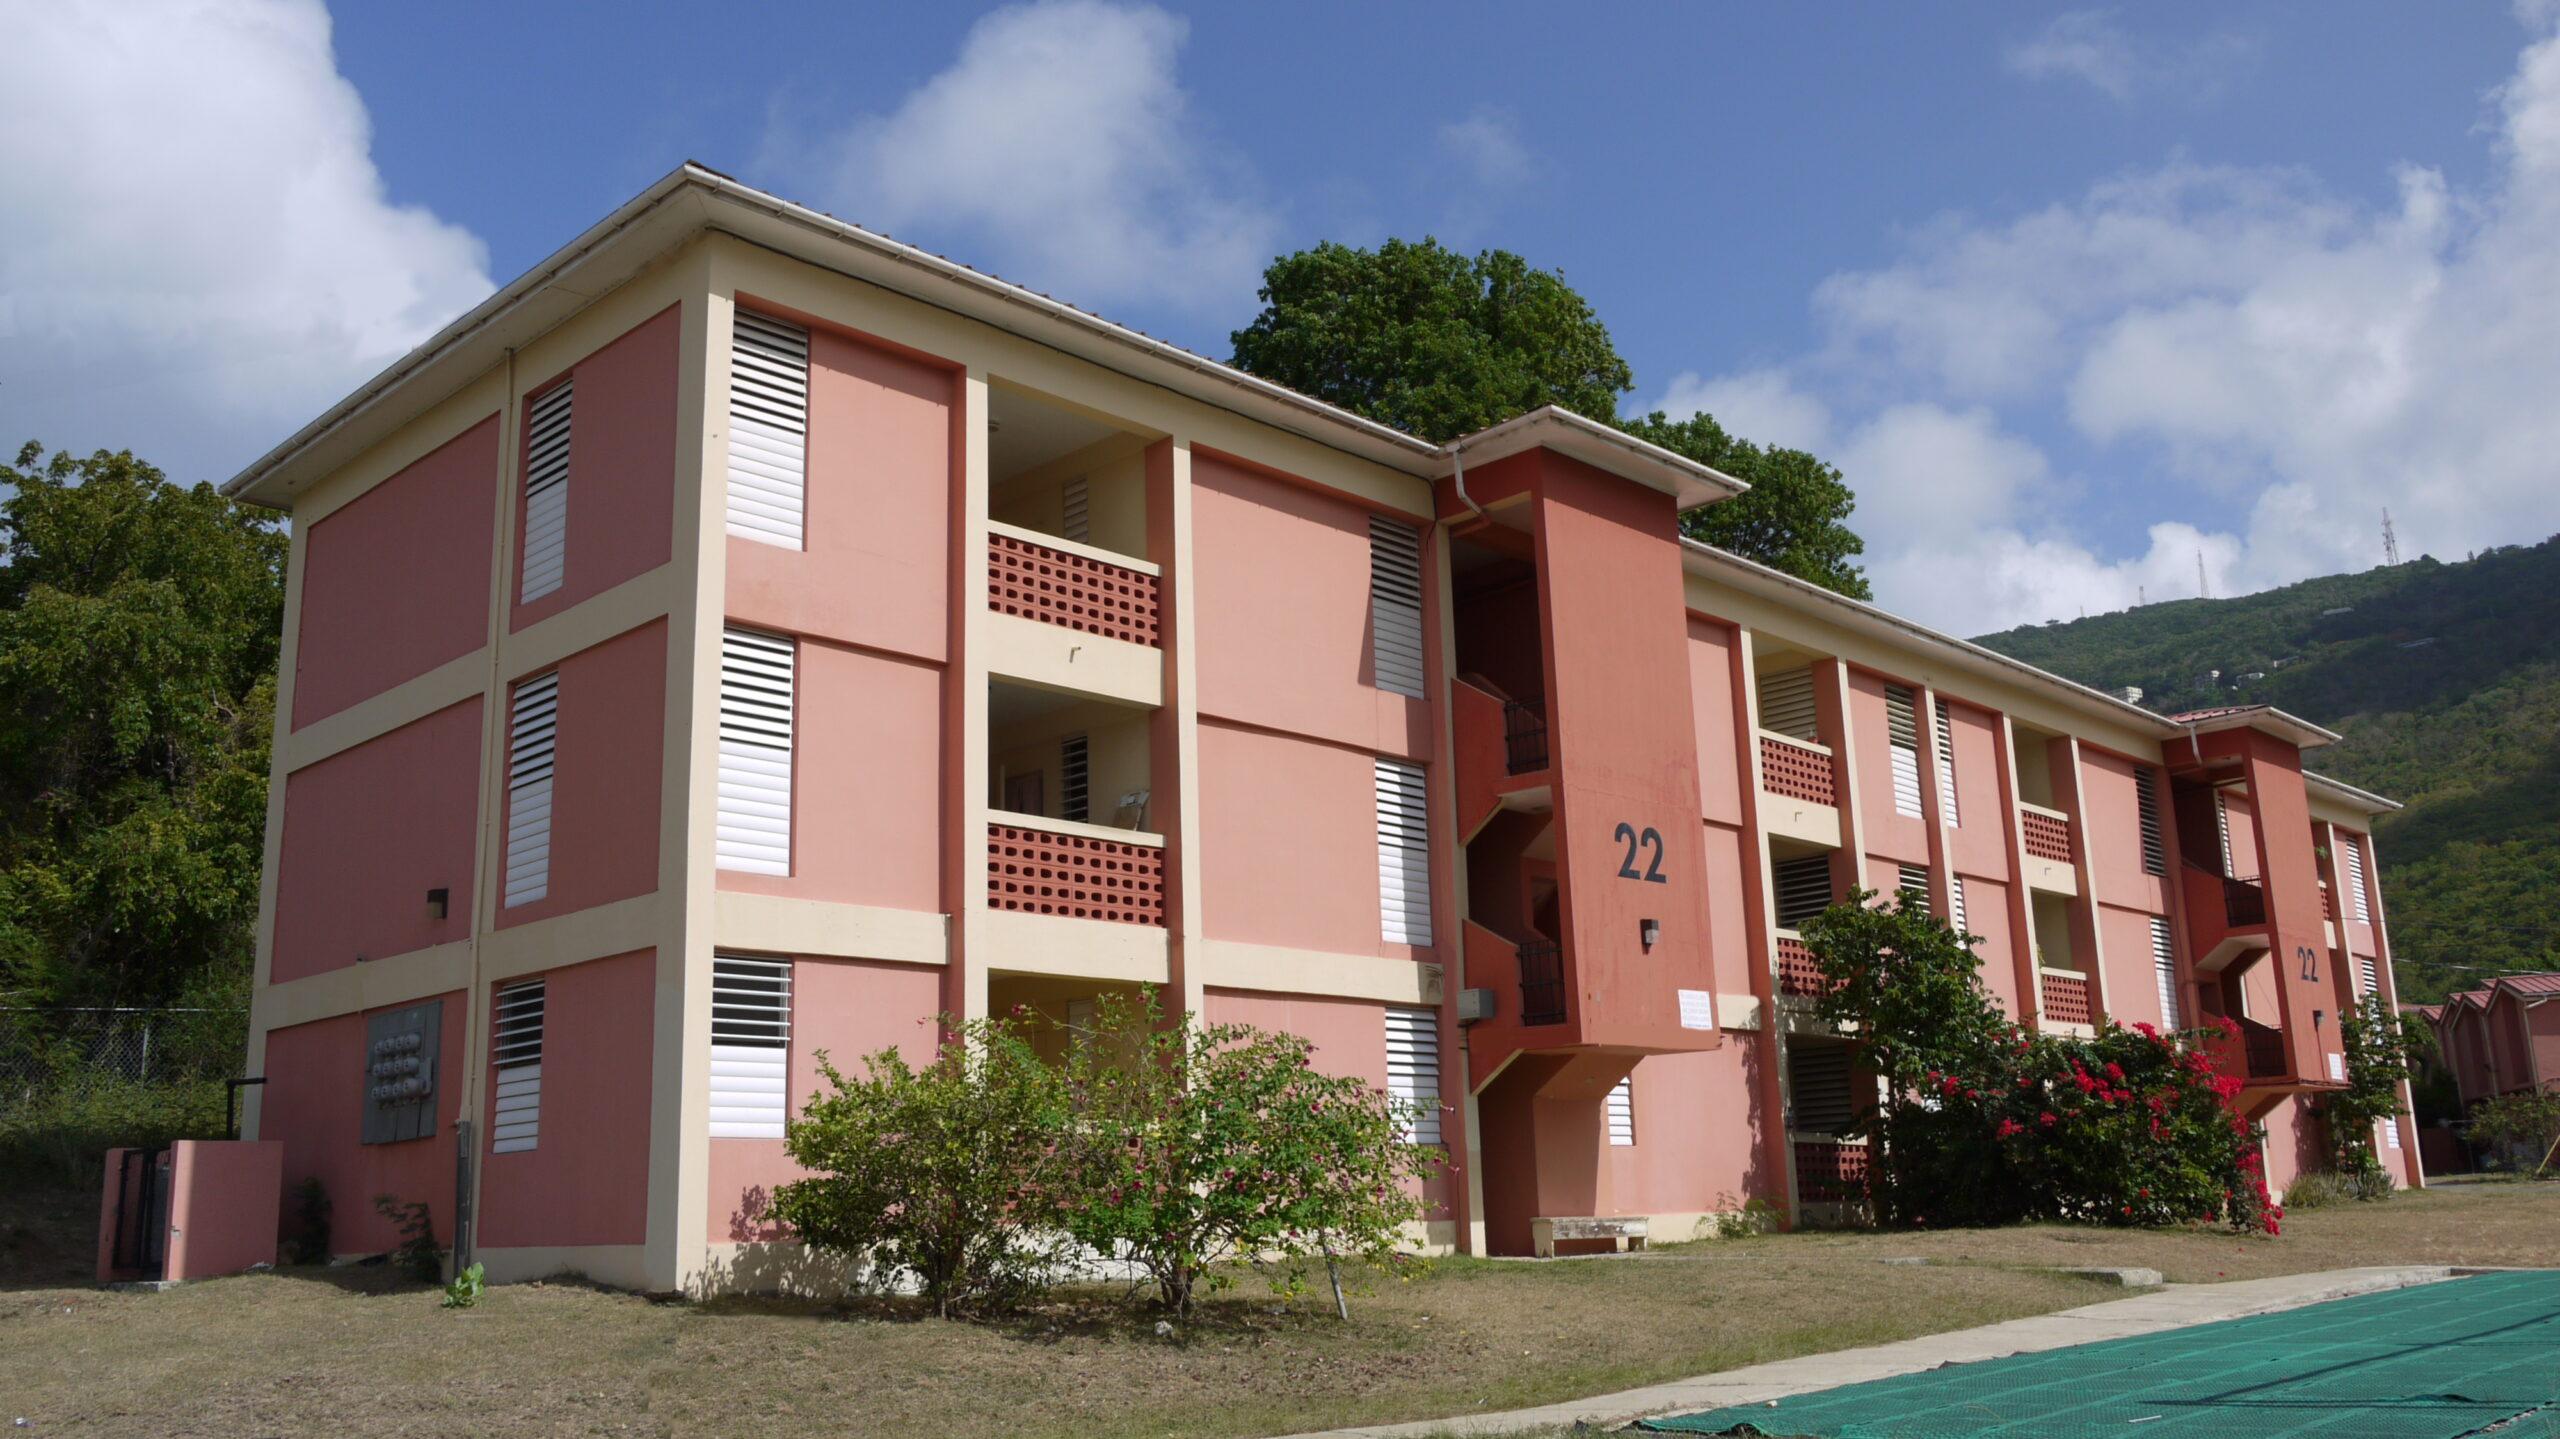 Kirwan Terrace Housing Community Painting